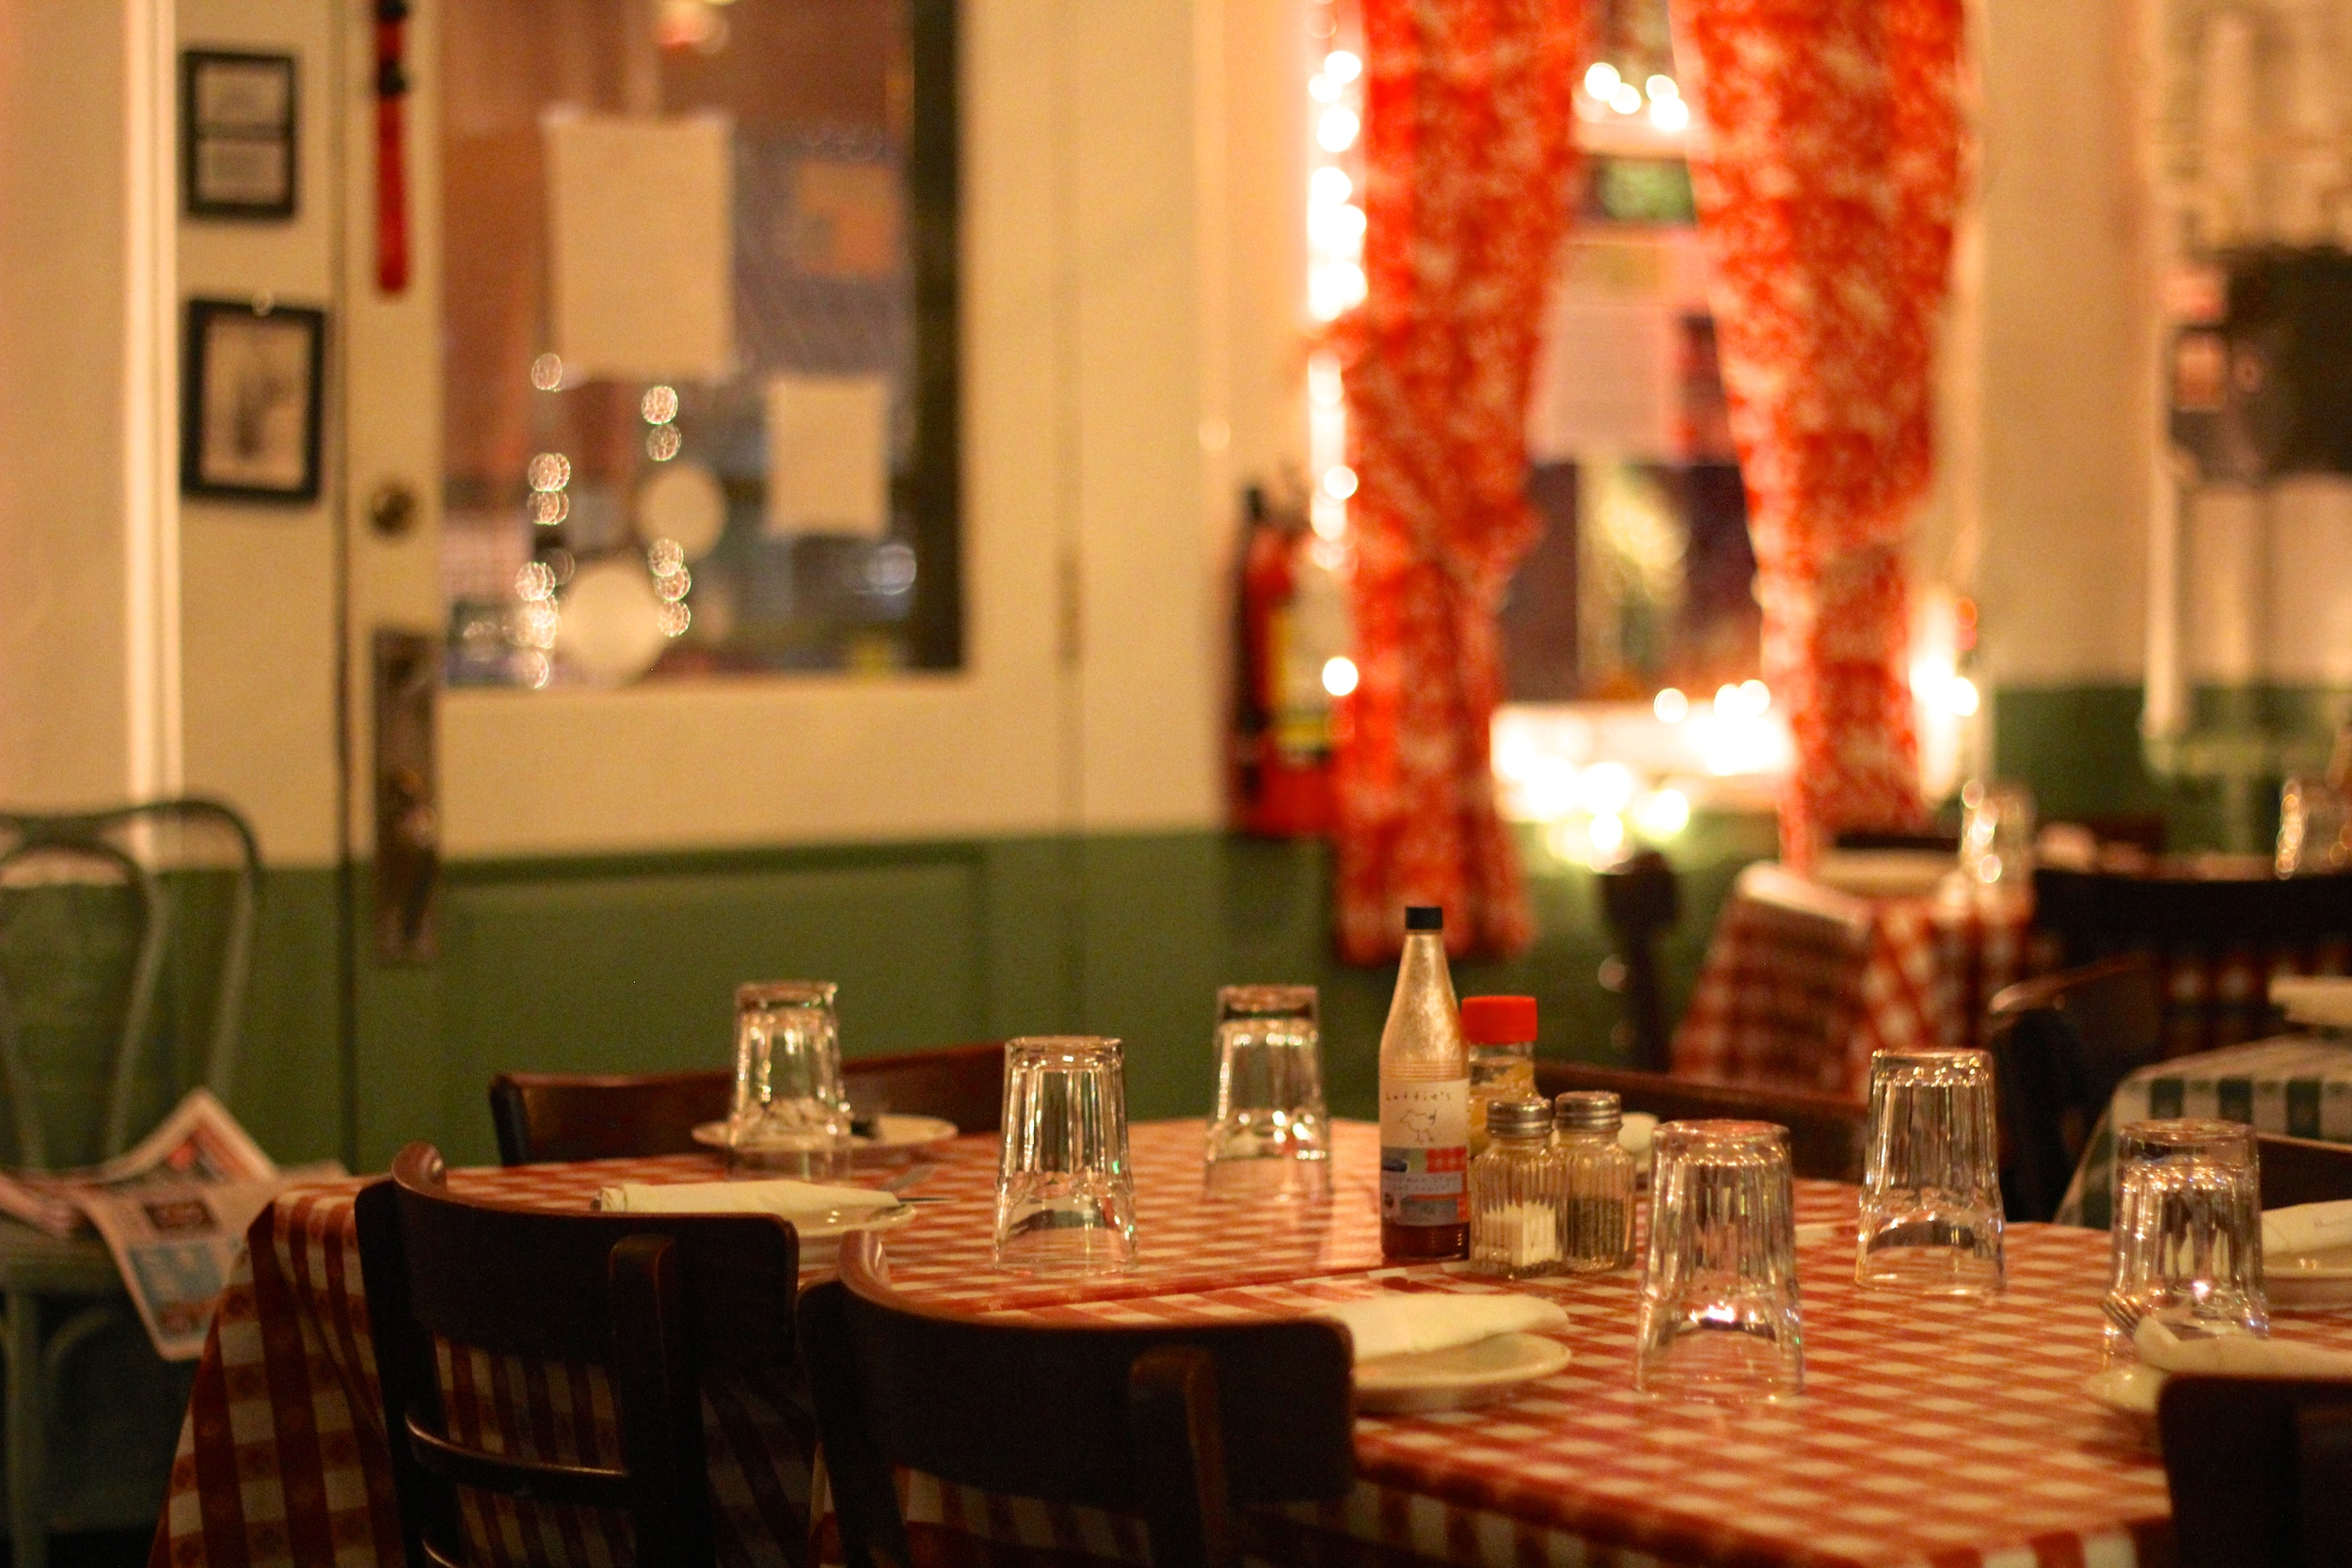 {We had great fried chicken at a cozy restaurant, Hattie's, in Saratoga}